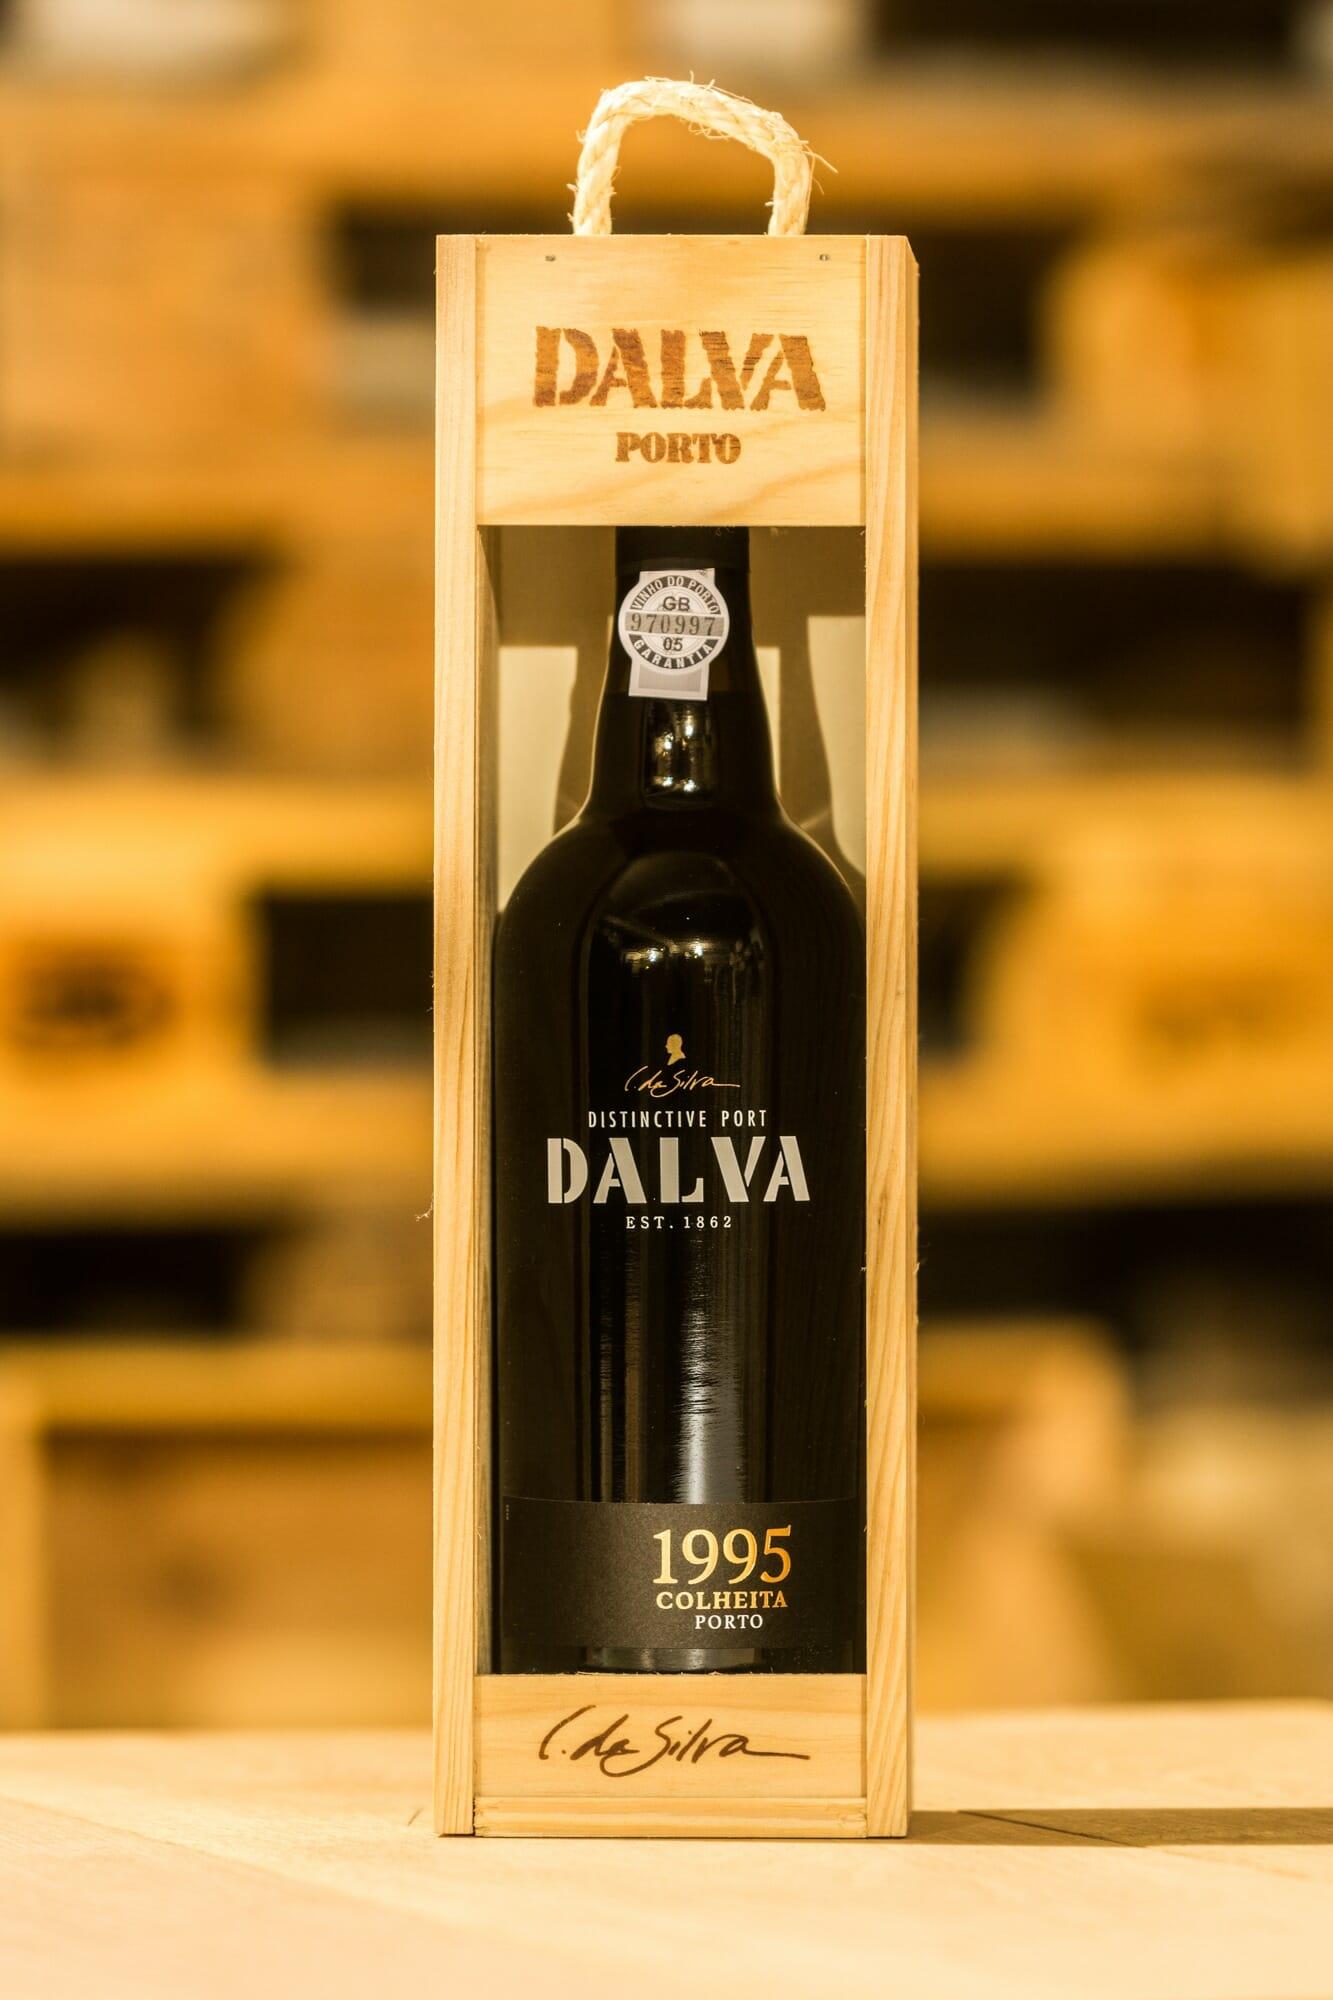 C. da Silva Dalva Colheita Port 1995